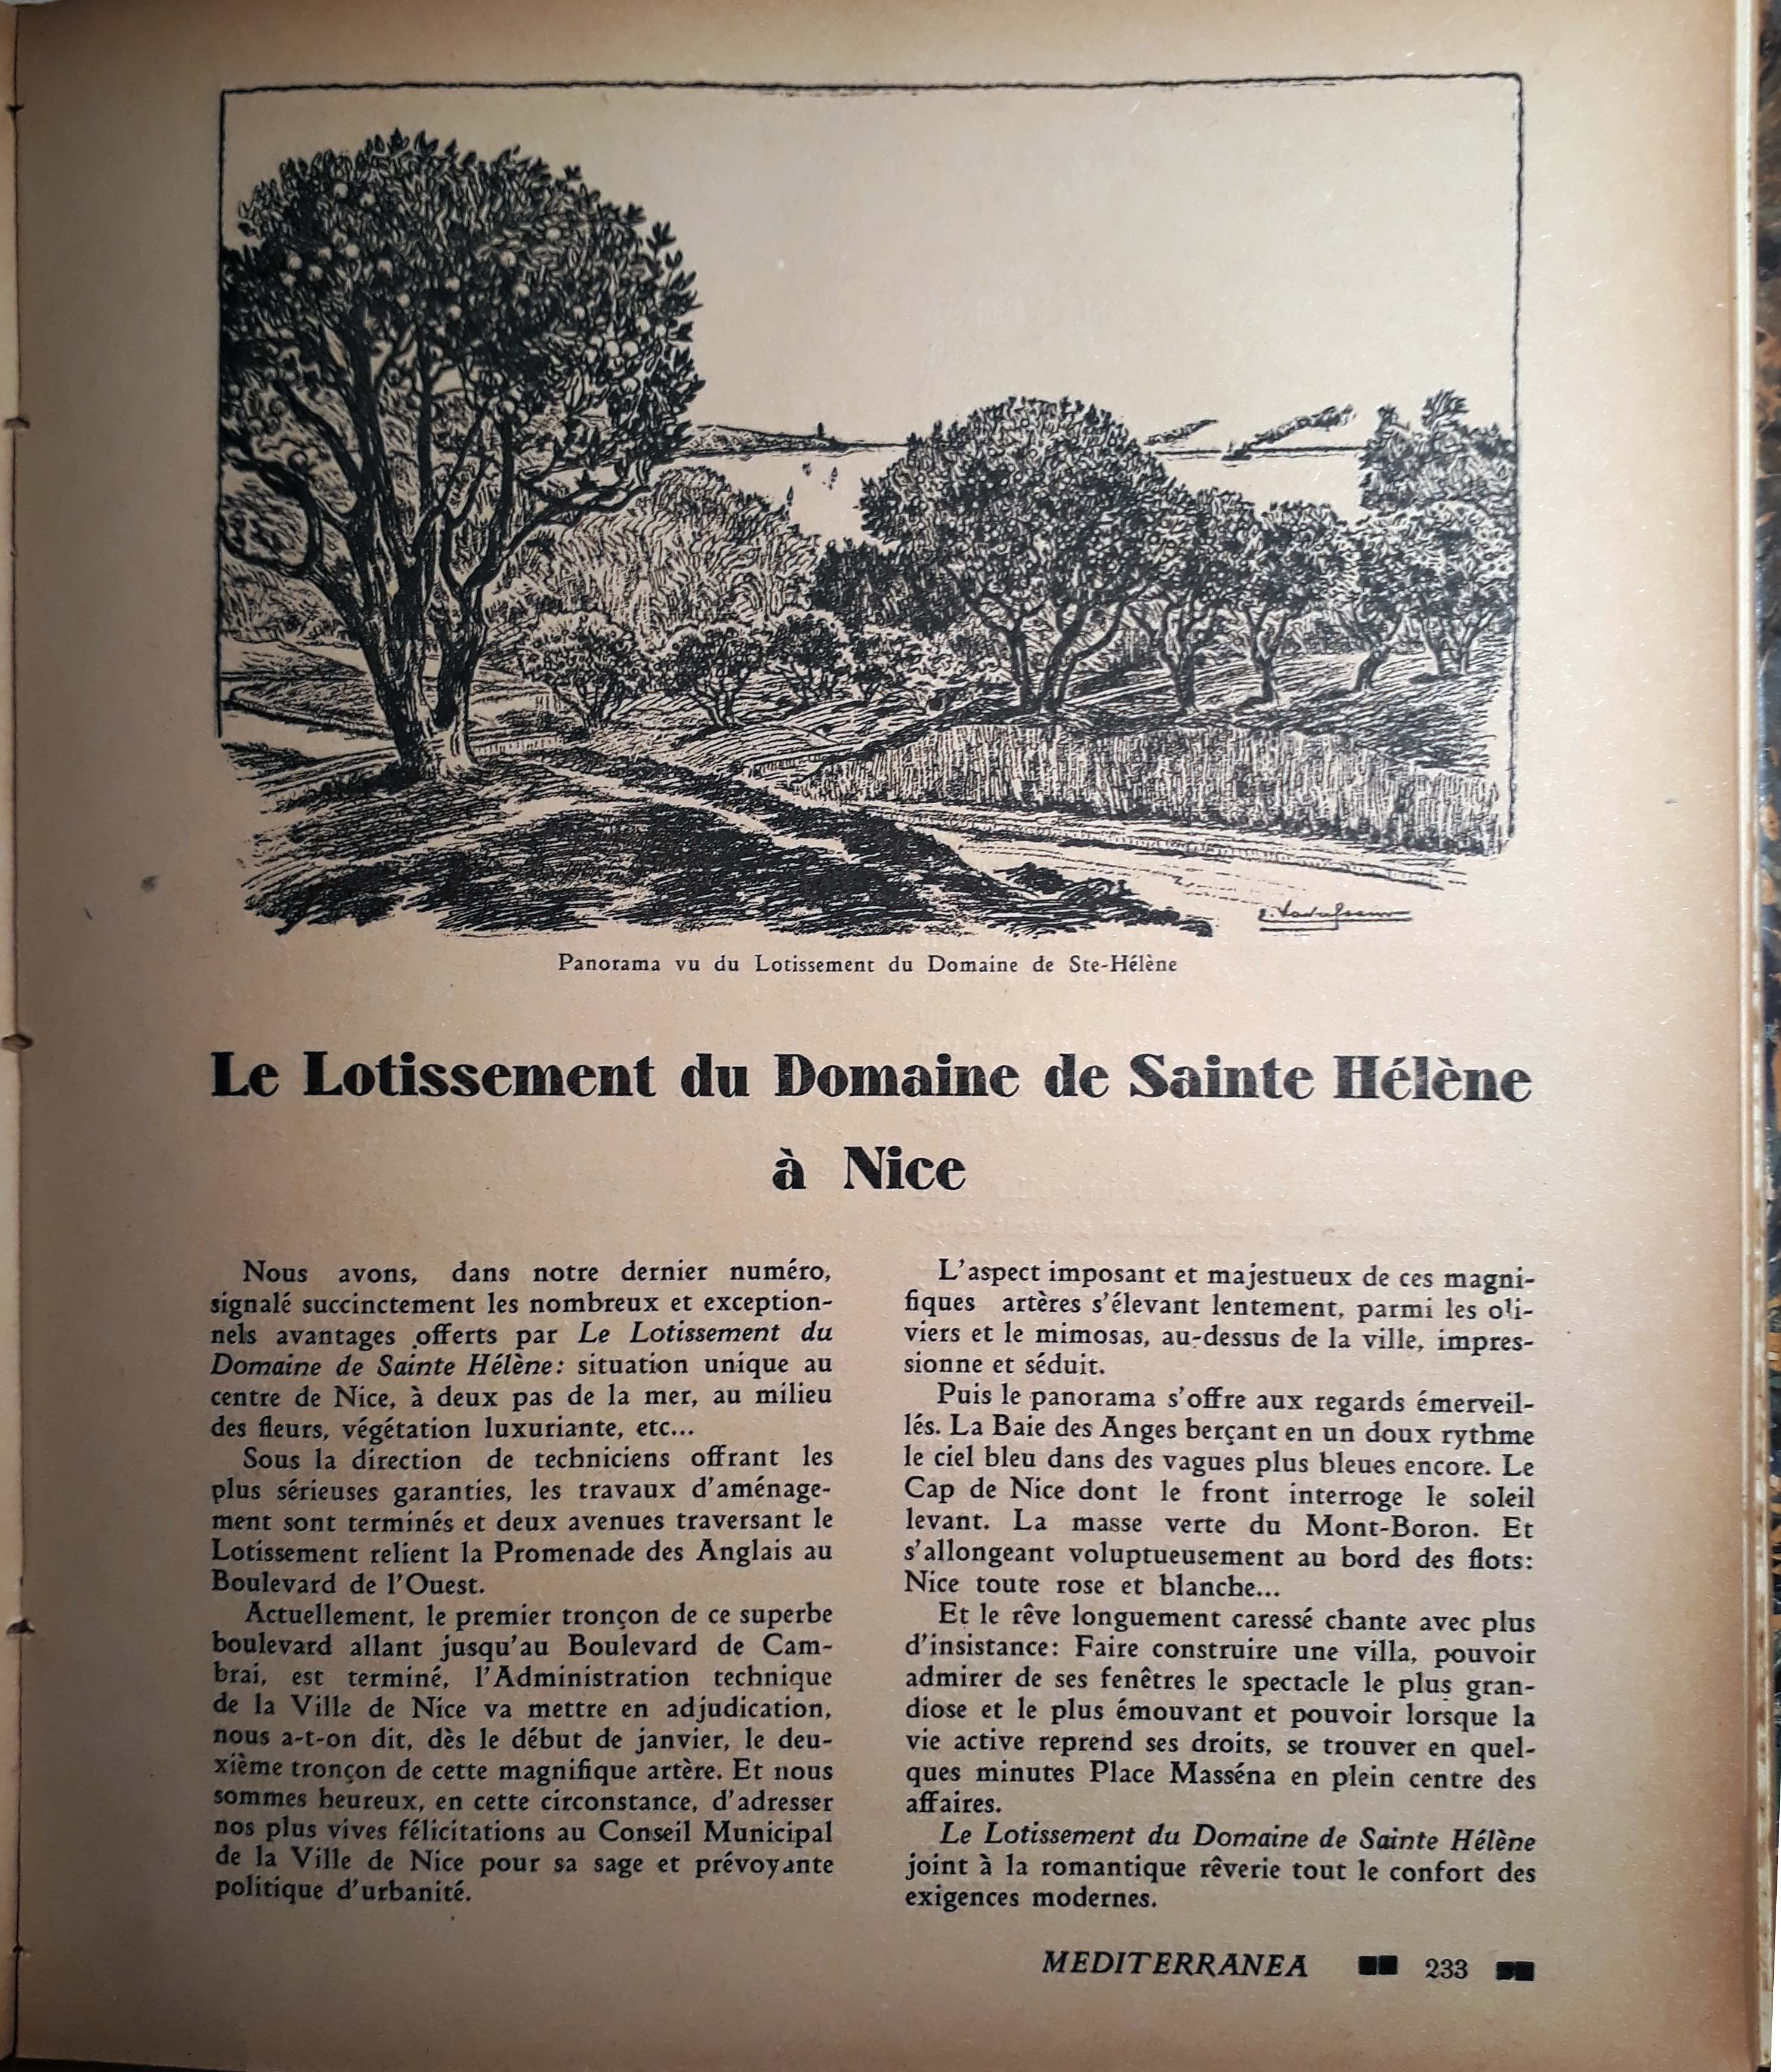 MEDITERRANEA P233